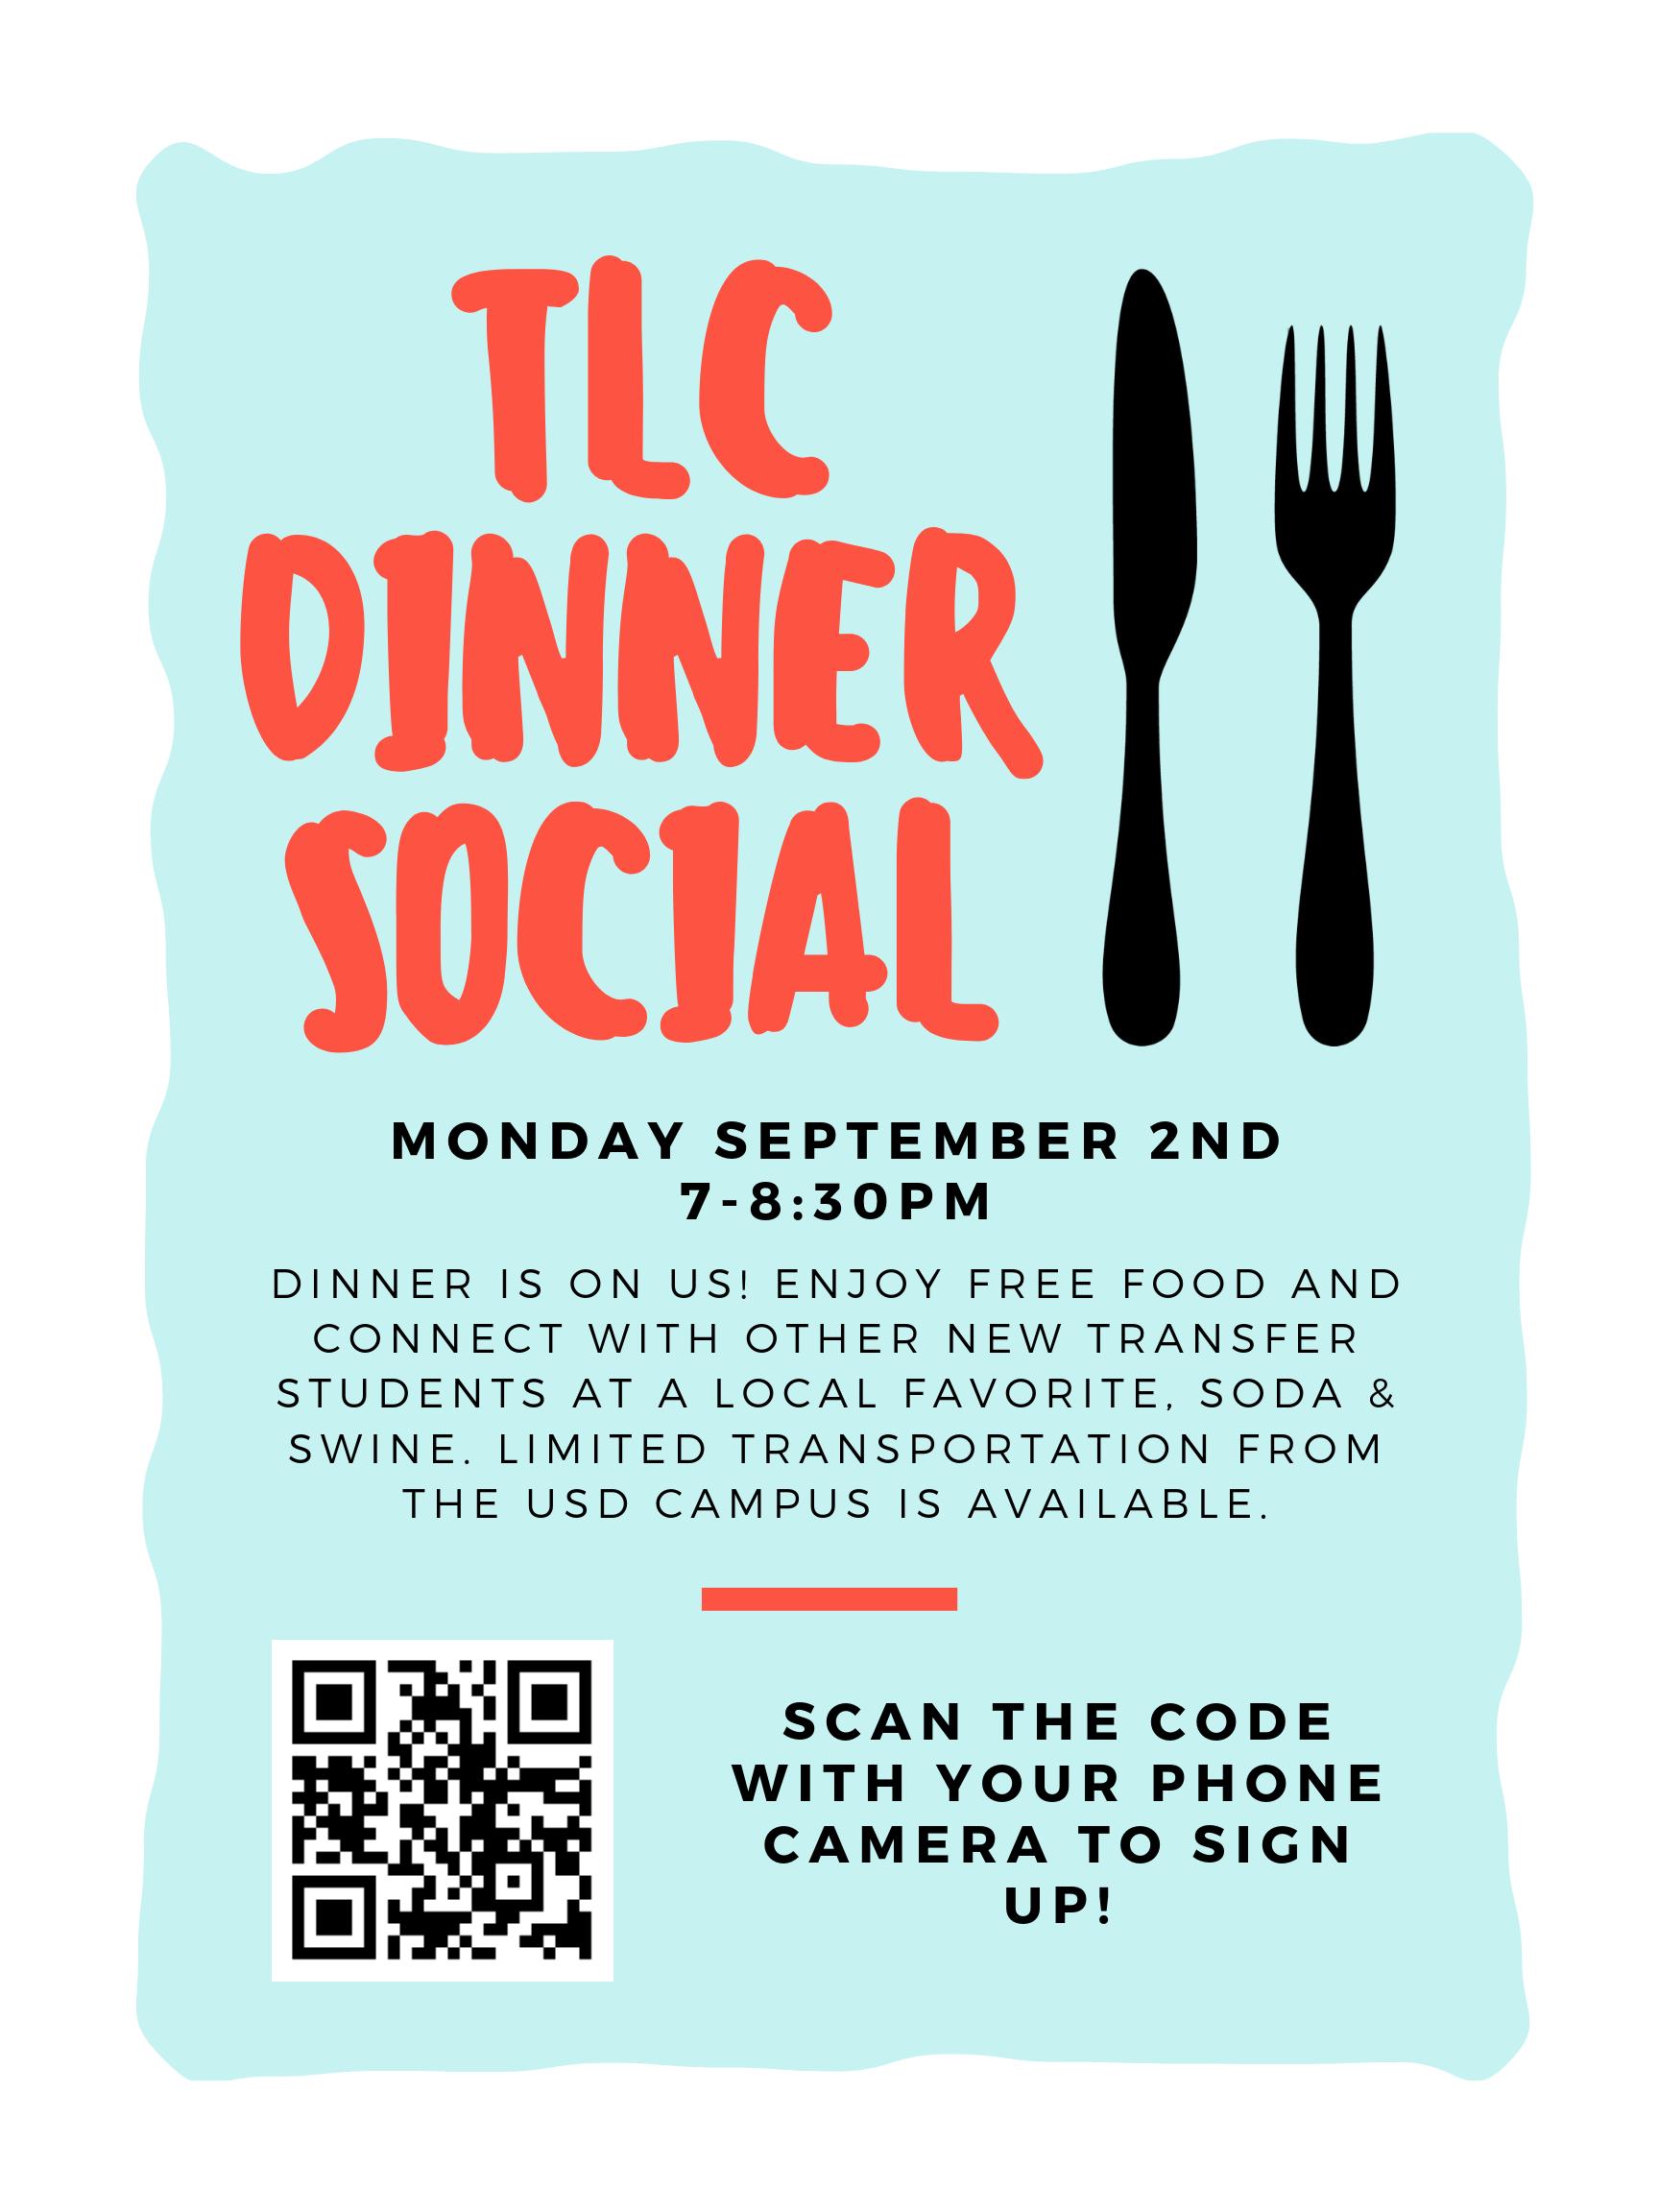 TLC Dinner Social flyer